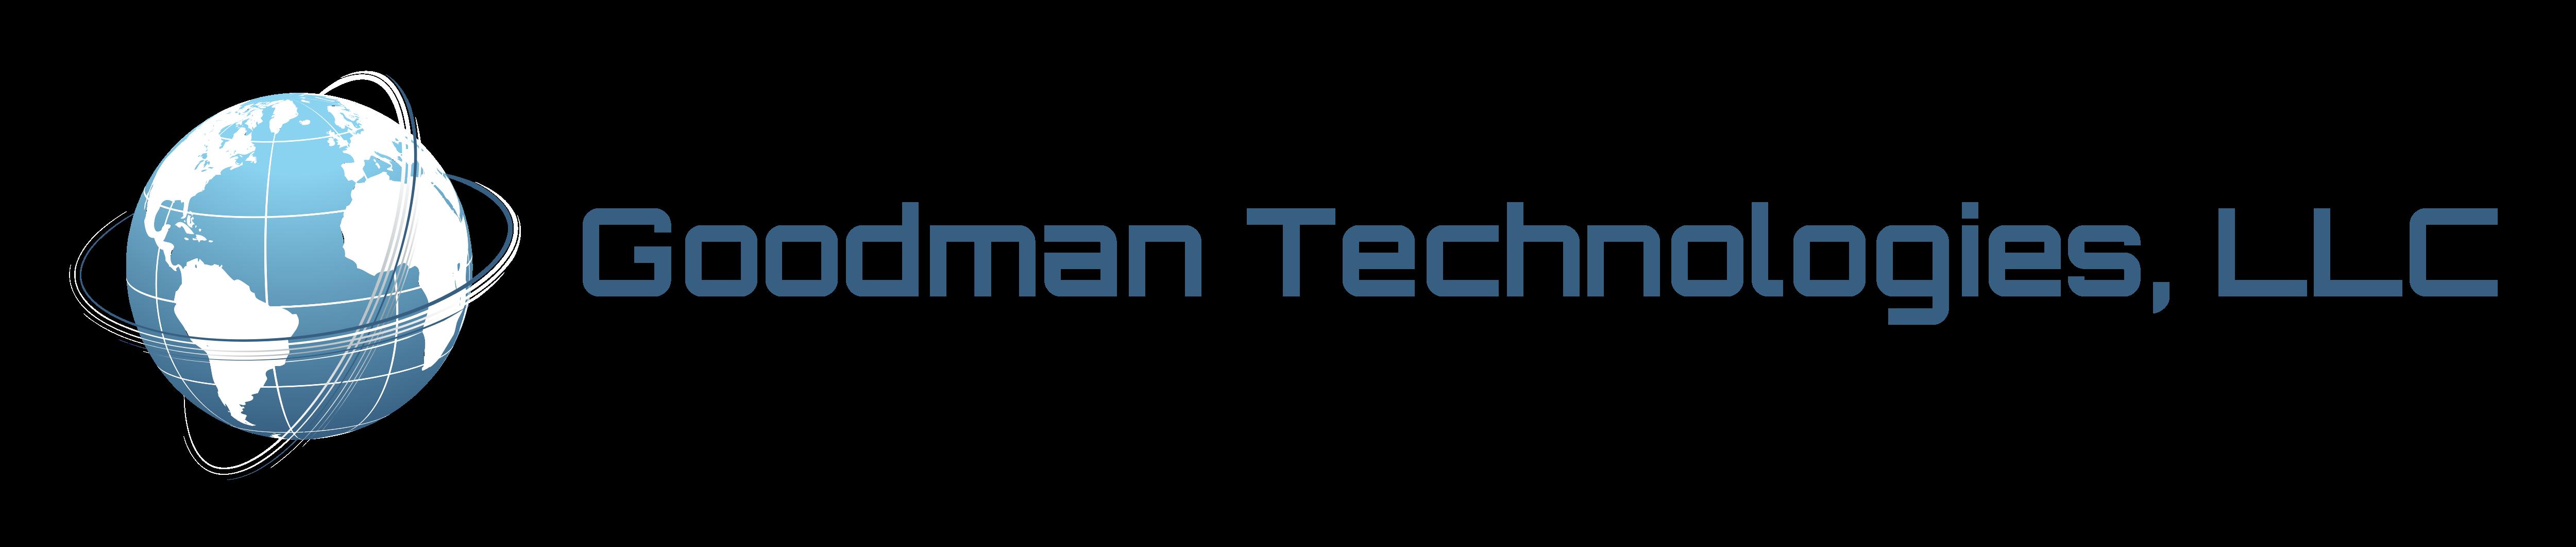 Goodman Technologies LLC Logo